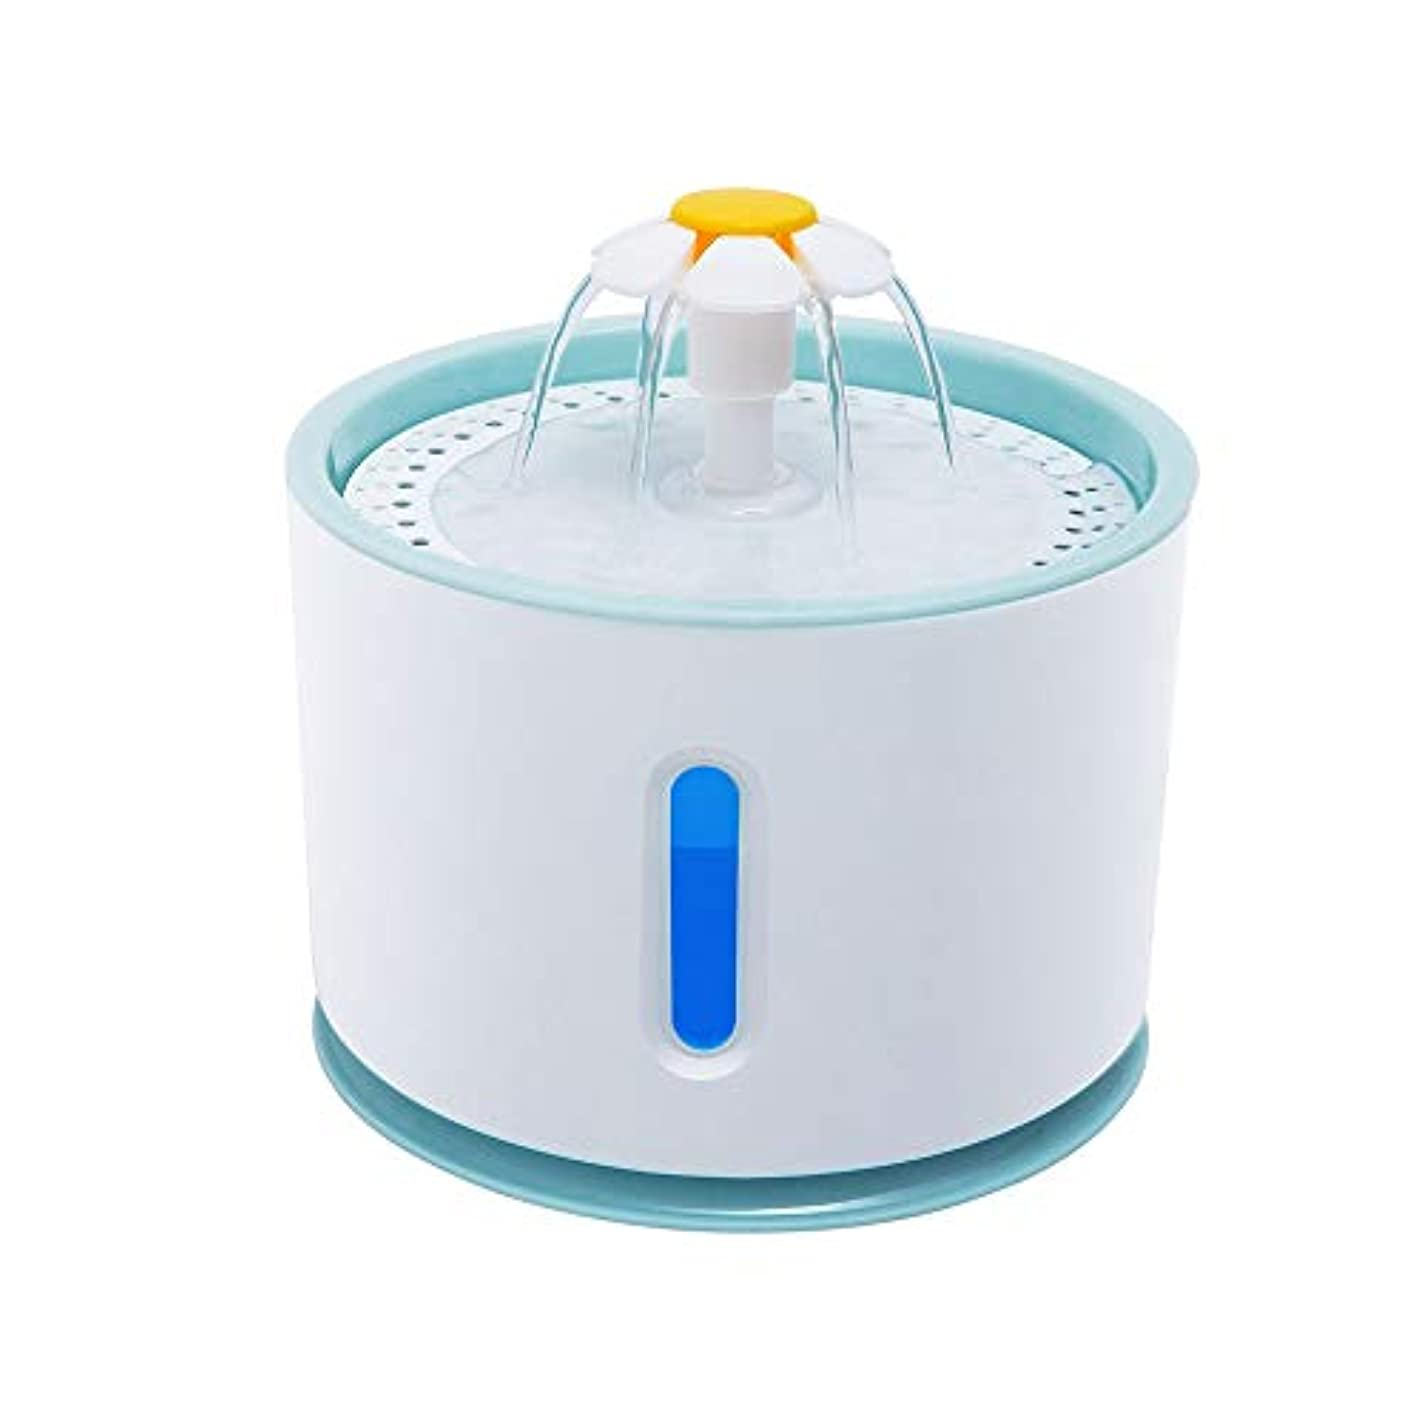 Rakuby 2.4Lペット 水噴水 花 プラスチック ふたLED 透明 水位 窓付き 自動電気 飲み物ディスペンサー ボール